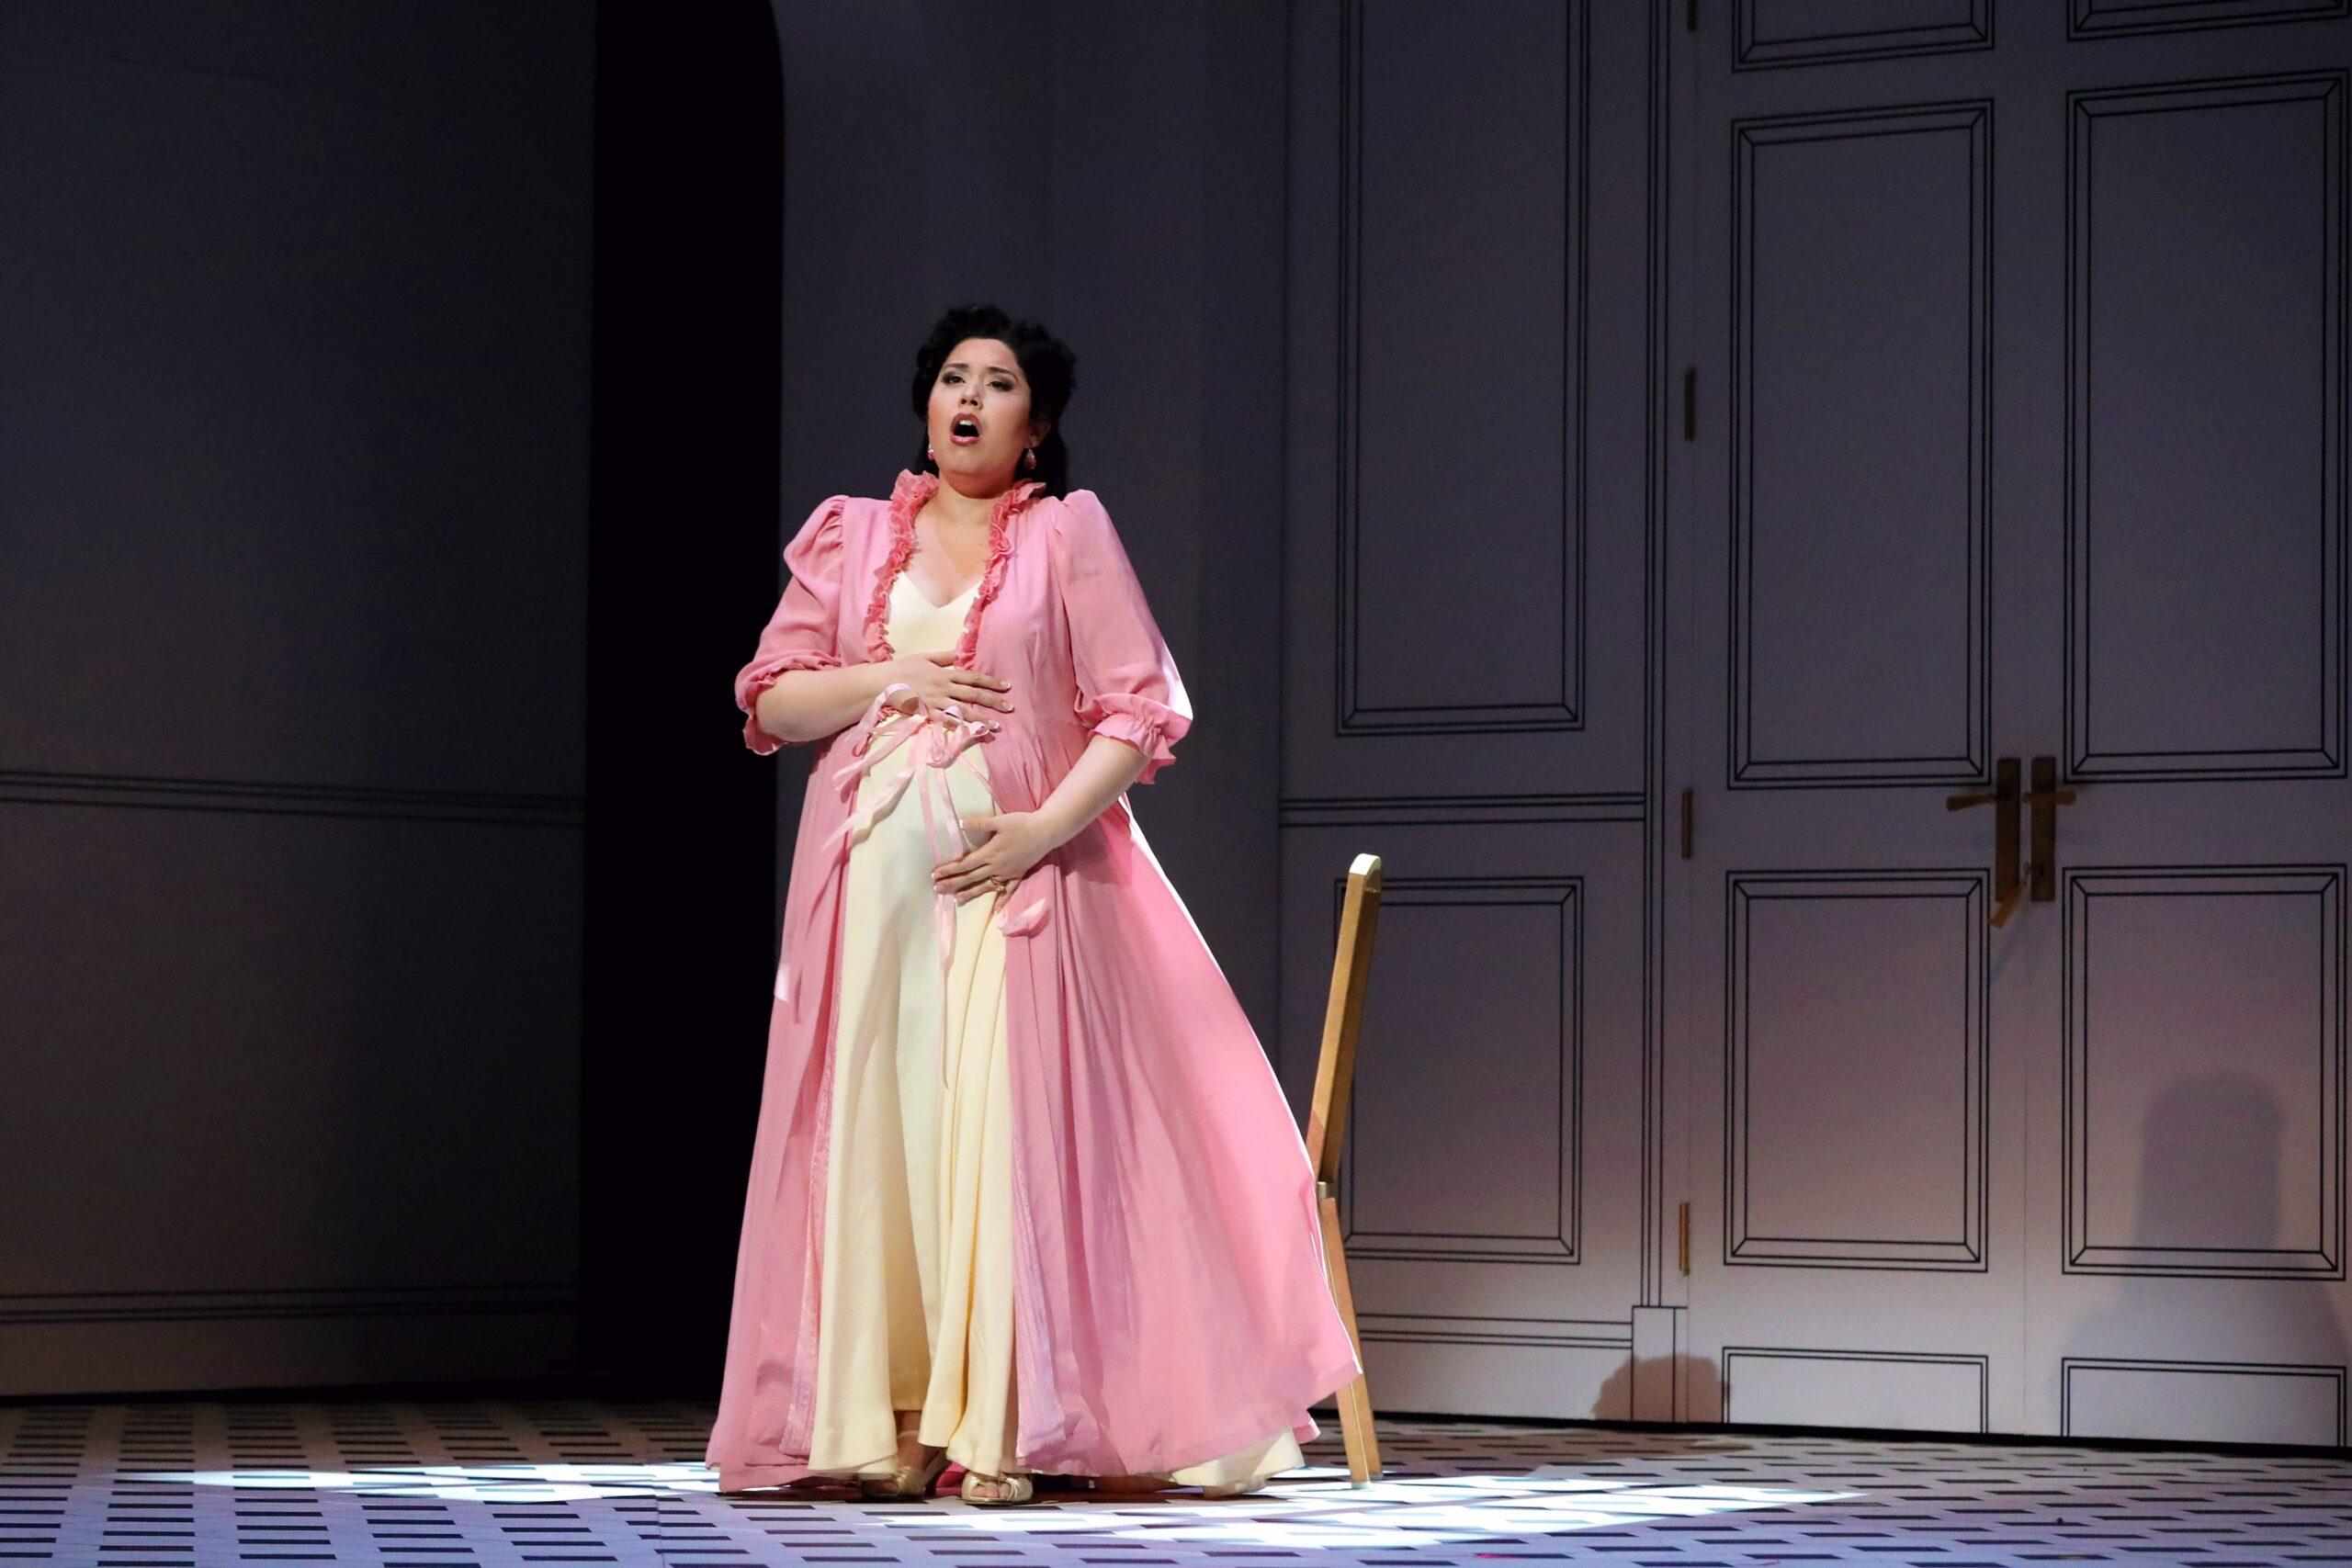 Vanessa Vasquez (Countess Almaviva). Photo Credit: Curtis Brown For The Santa Fe Opera, 2021